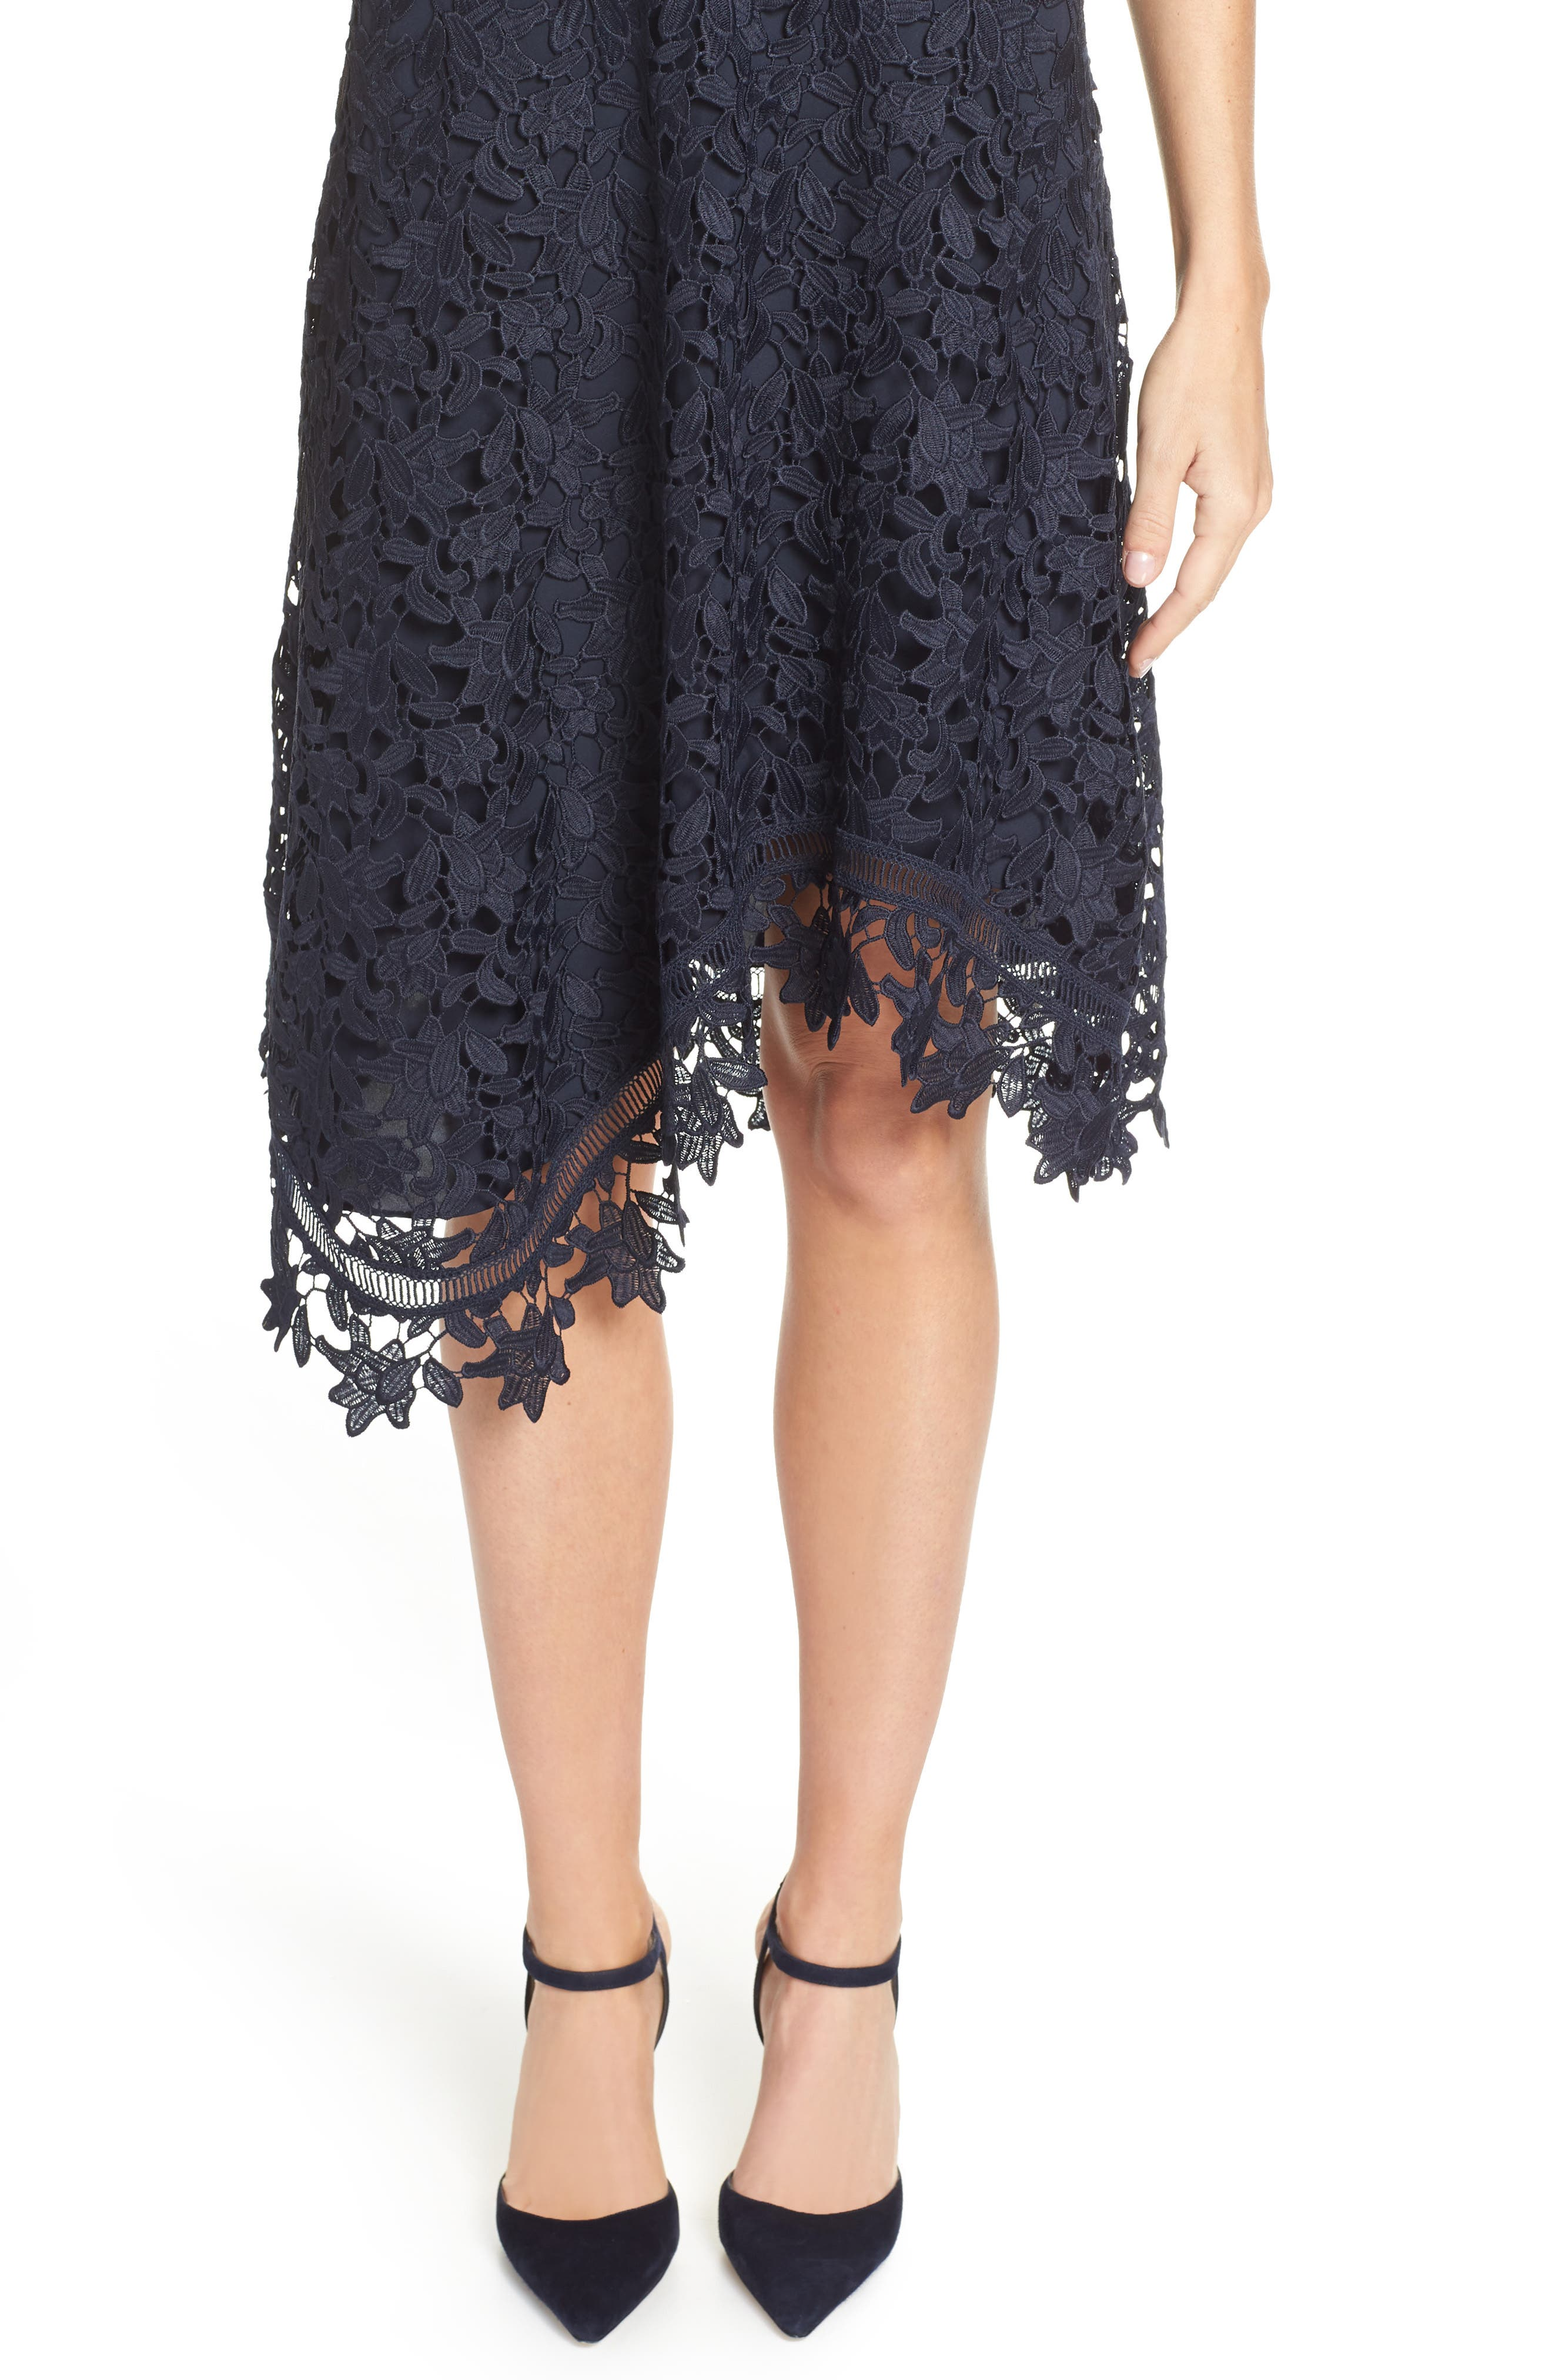 ELIZA J, Asymmetrical Lace Dress, Alternate thumbnail 5, color, NAVY